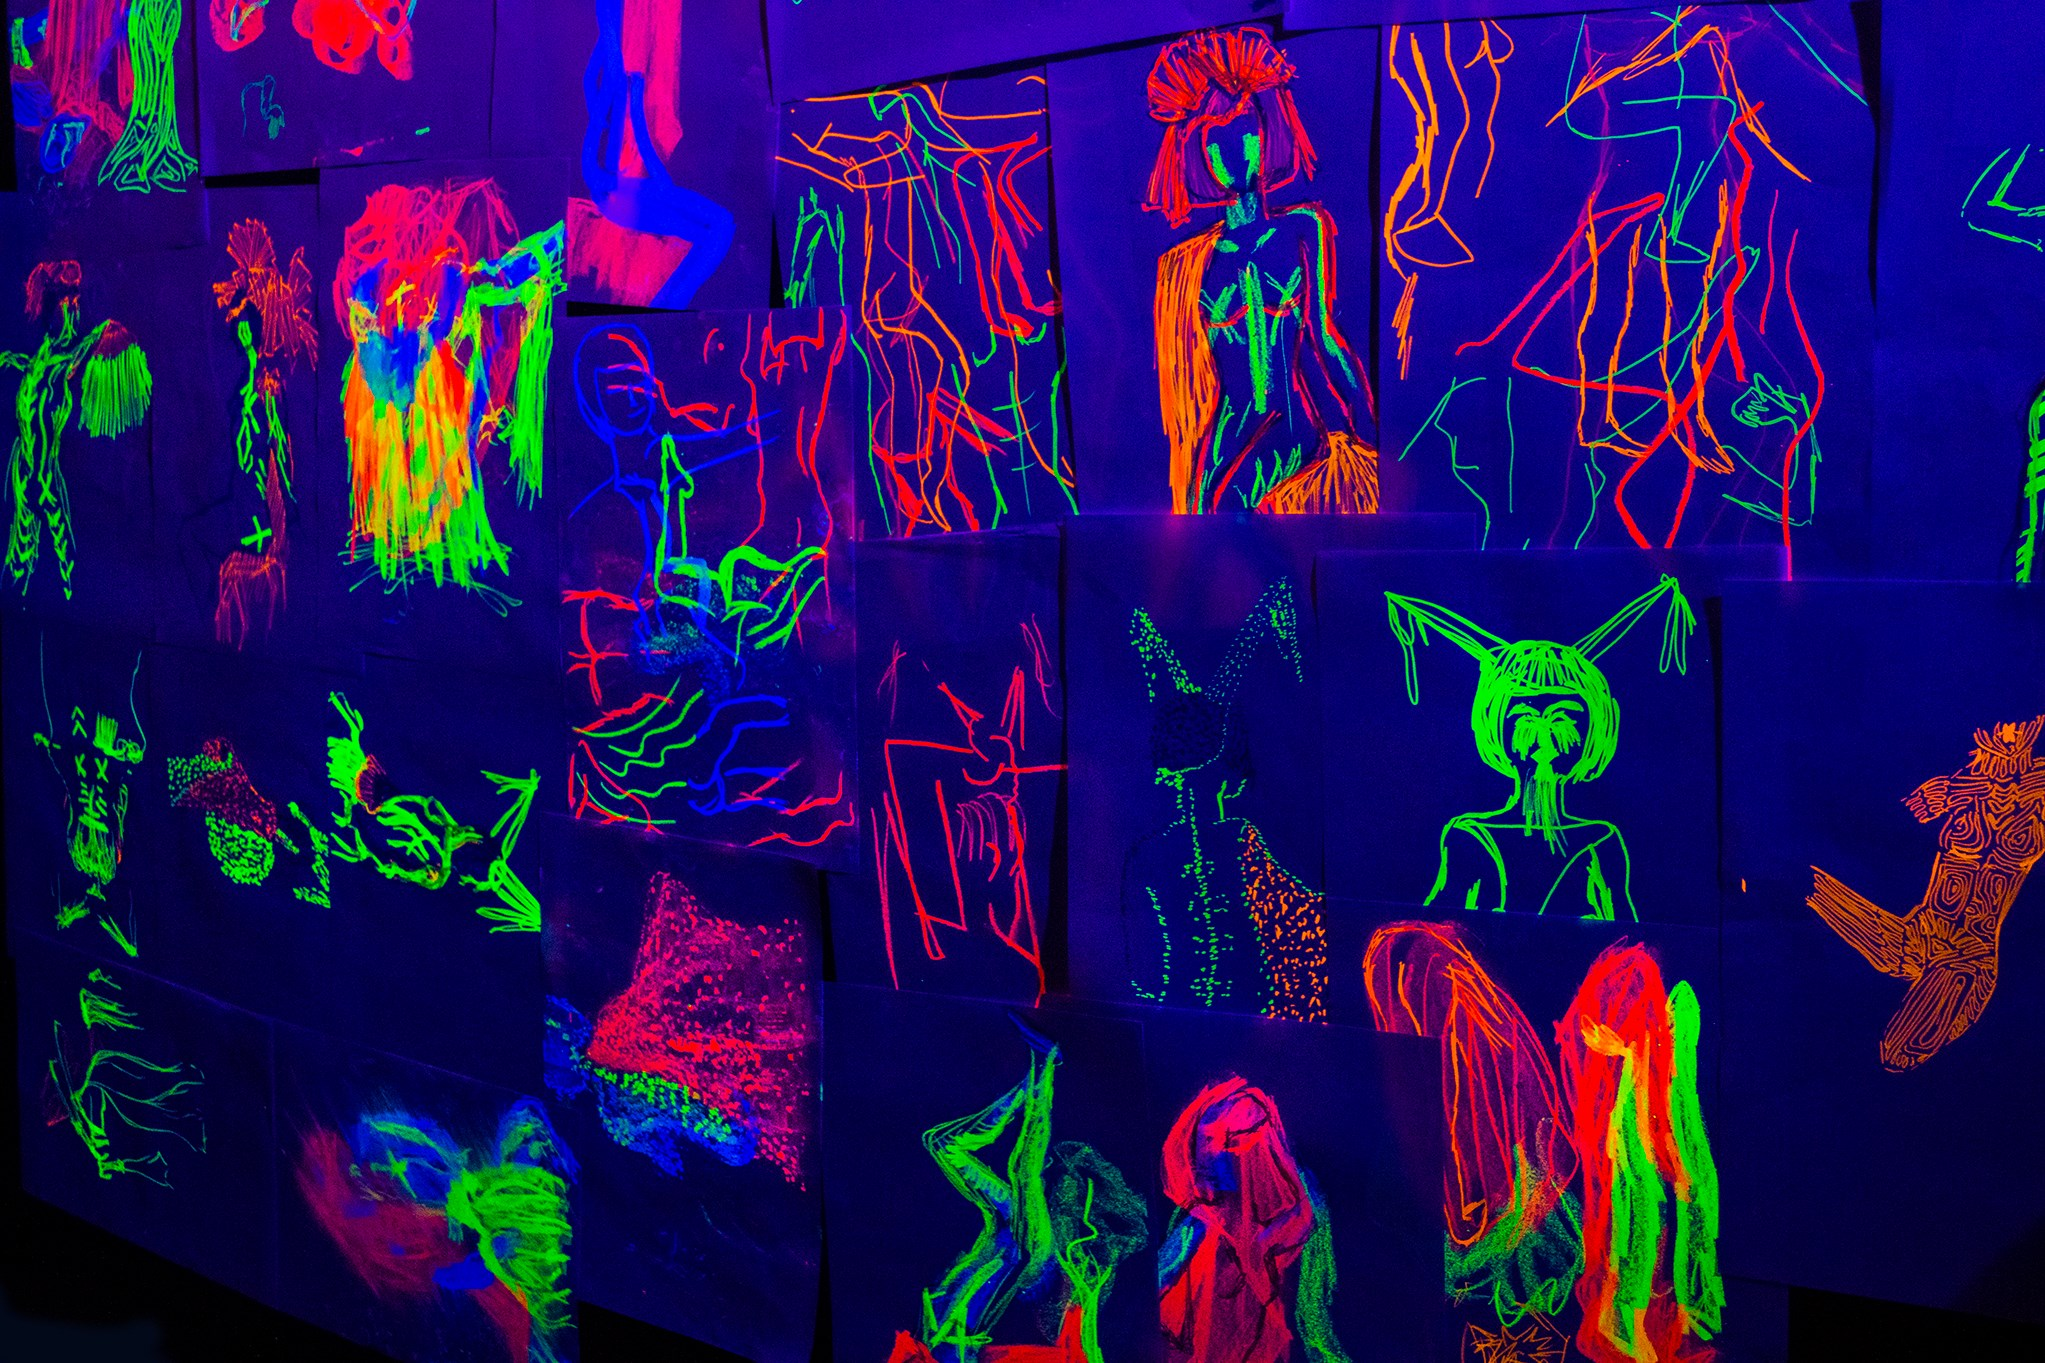 Naked Neon Drawings